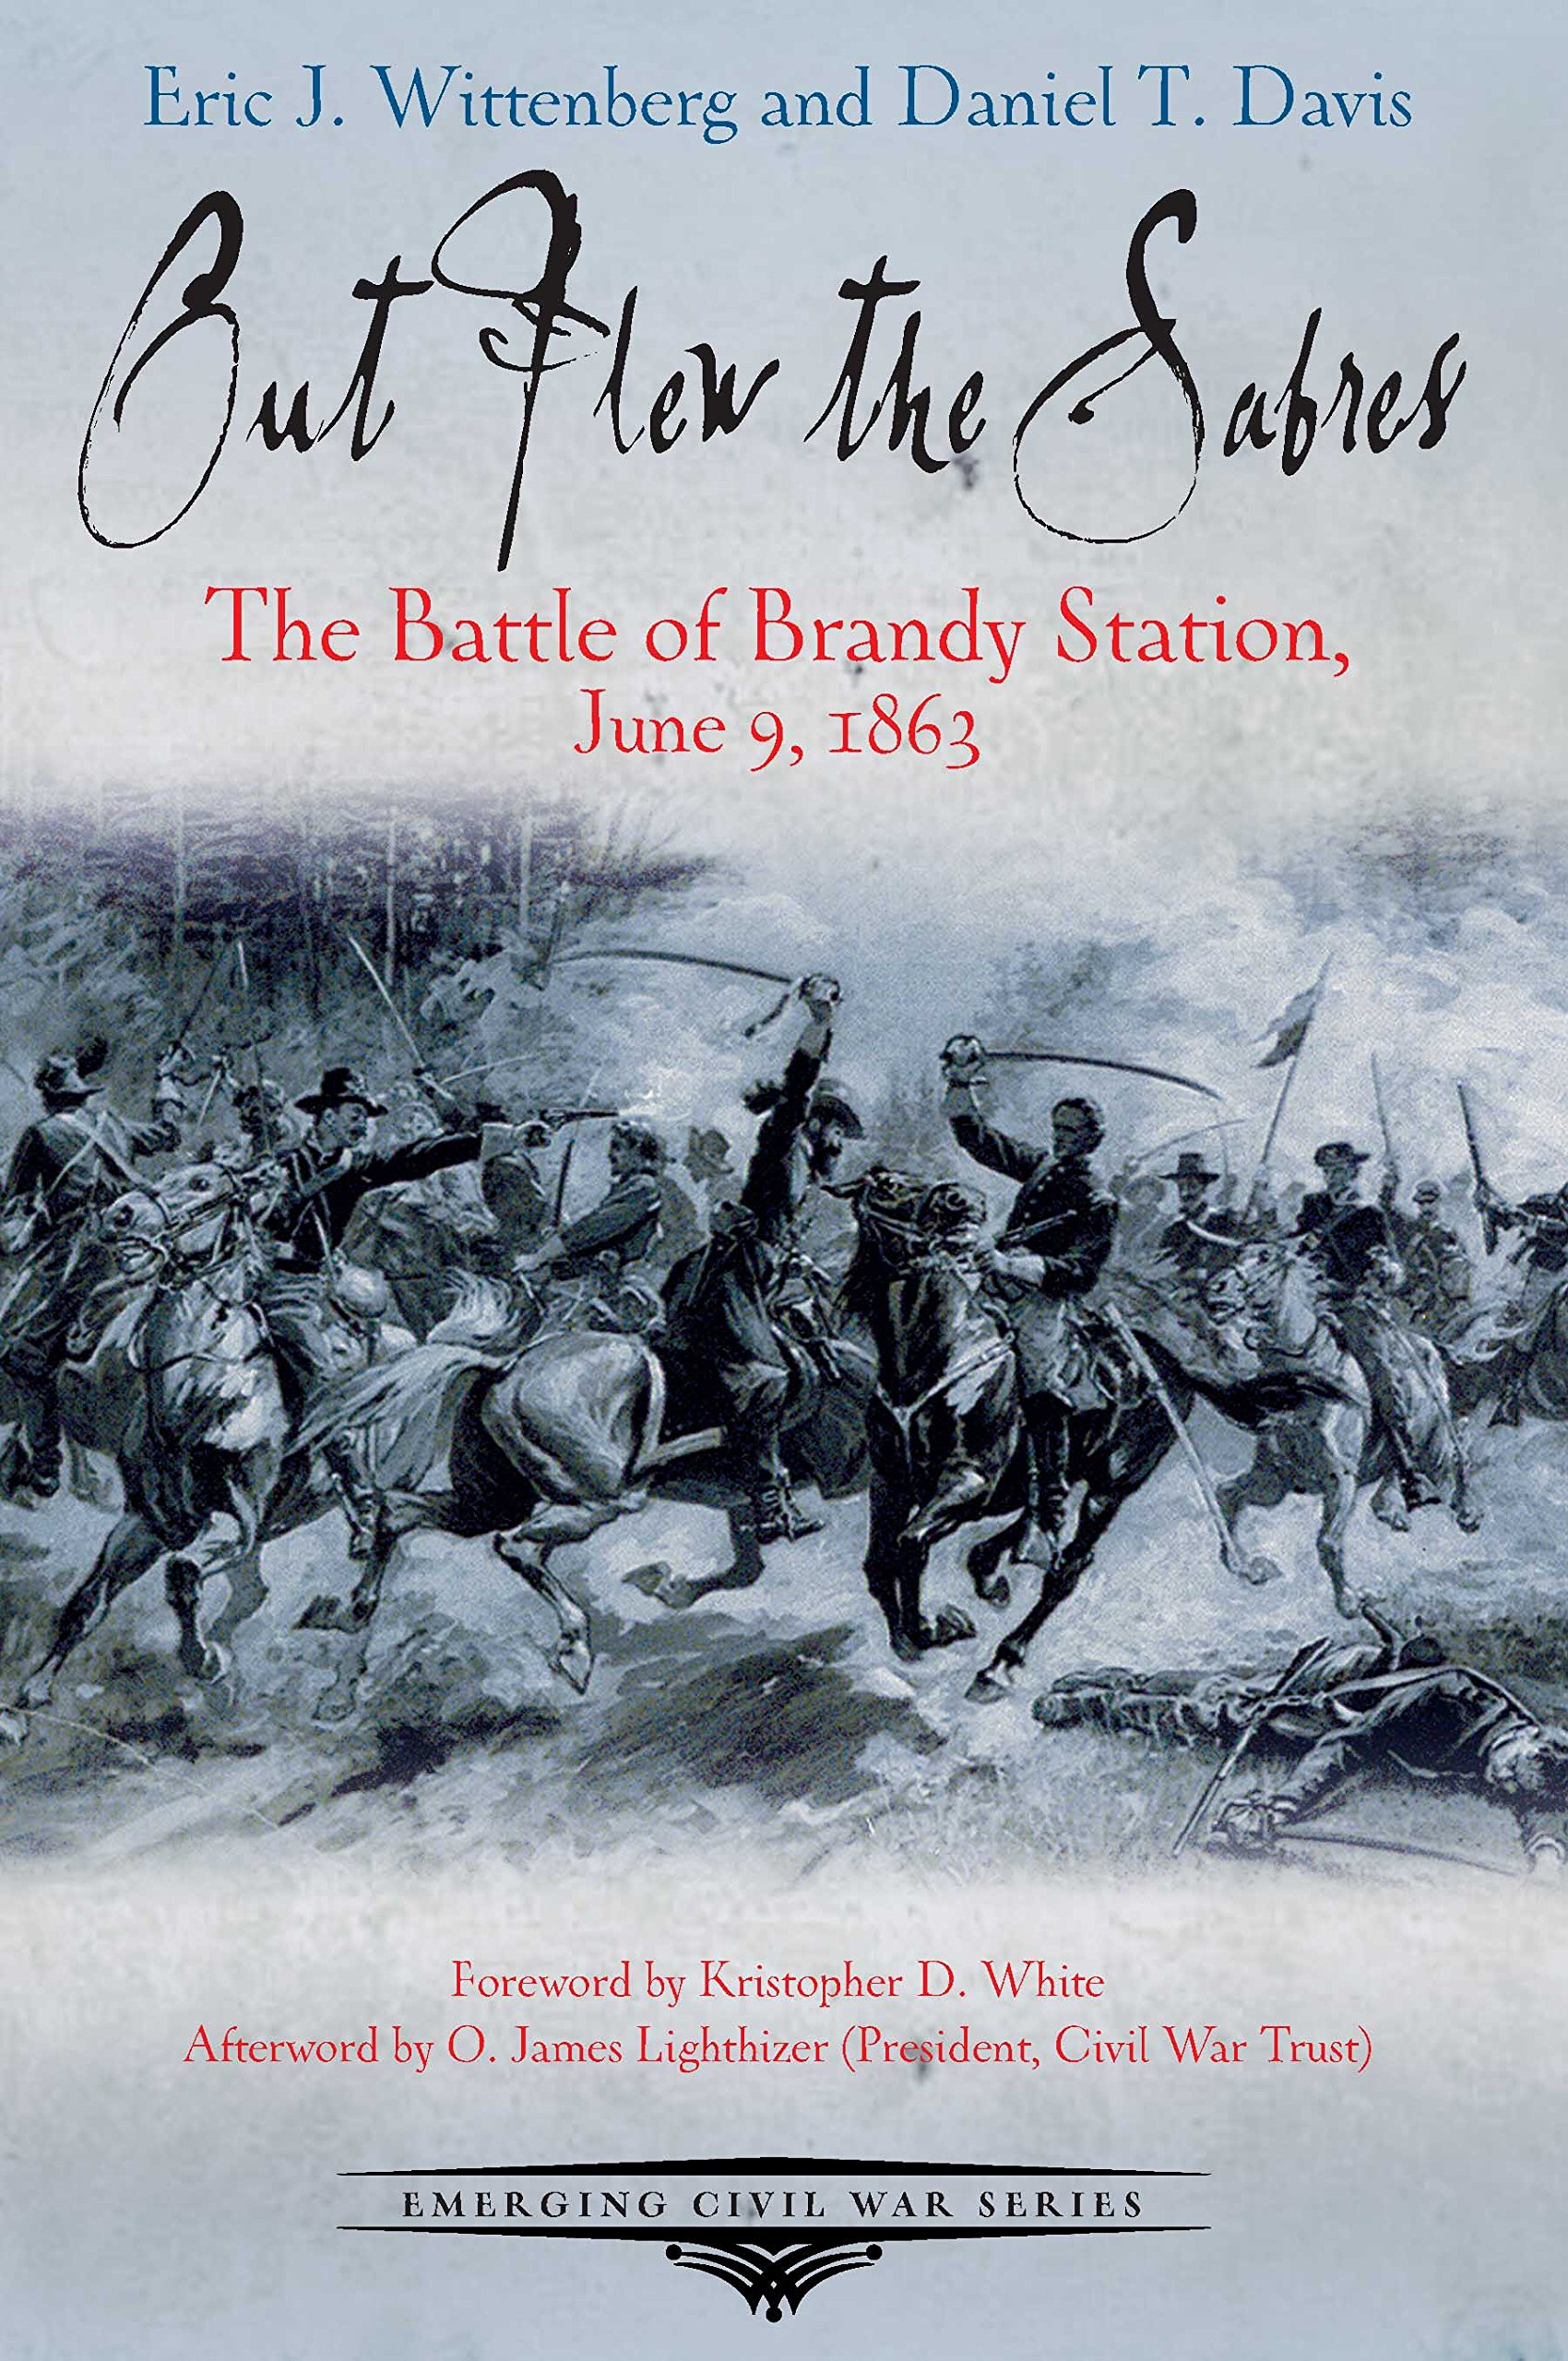 Out Flew the Sabres: The Battle of Brandy Station, June 9, 1863 (Emerging Civil  War Series): Eric J. Wittenberg, Daniel T. Davis: 9781611212563:  Amazon.com: ...